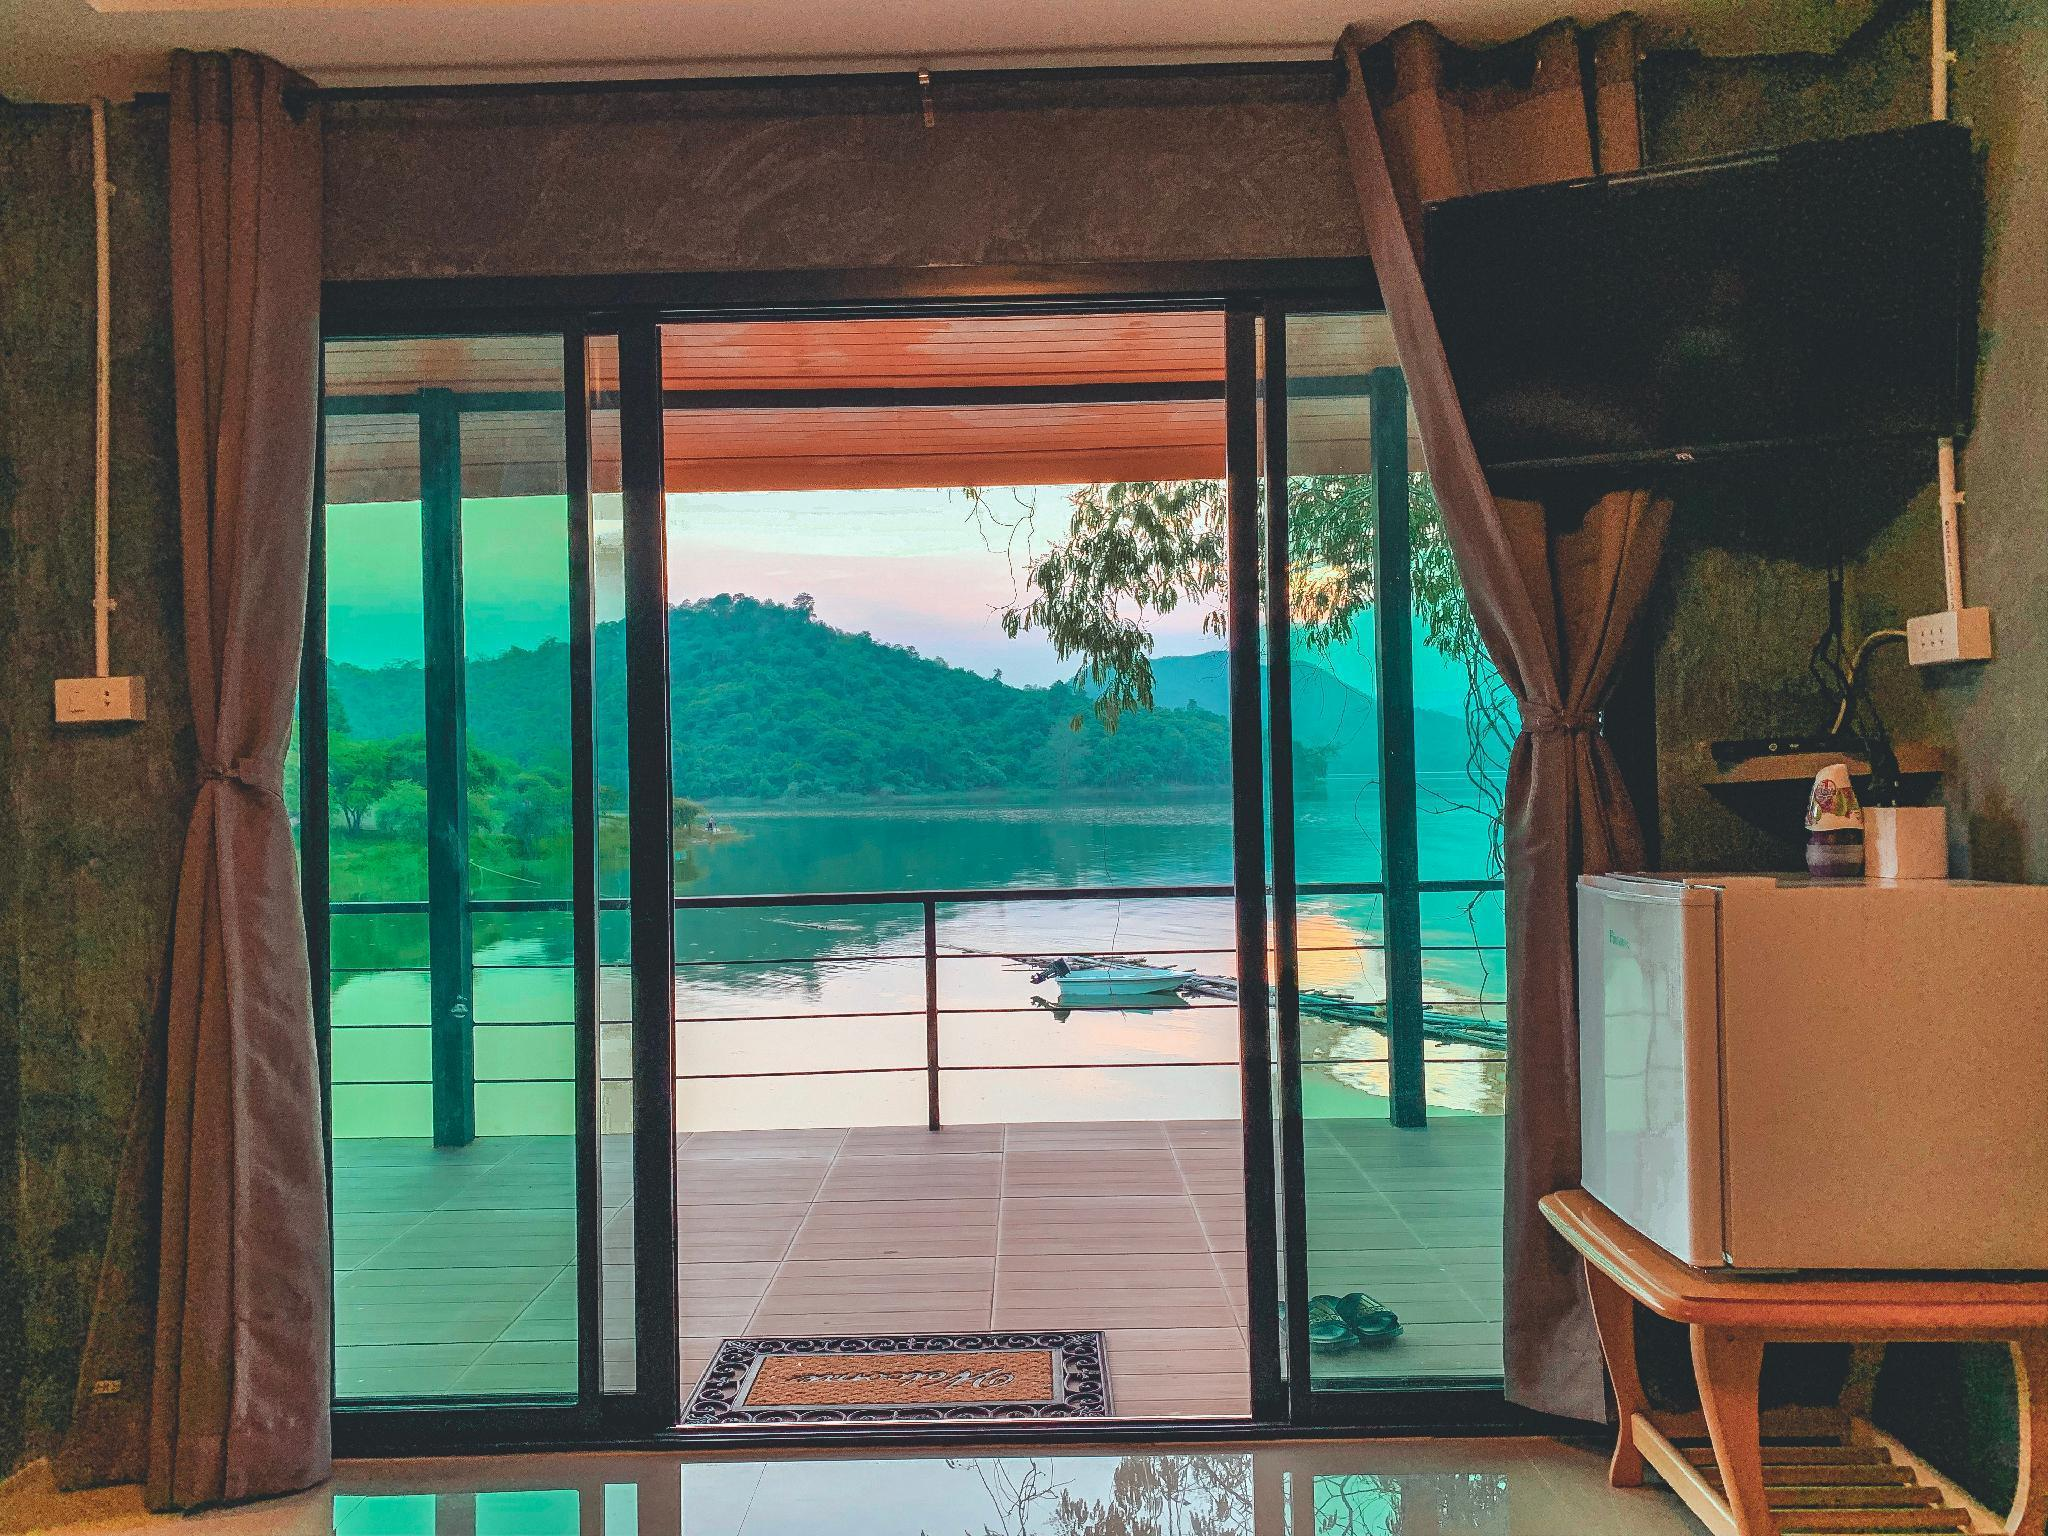 Lake view fishing camp บังกะโล 1 ห้องนอน 1 ห้องน้ำส่วนตัว ขนาด 30 ตร.ม. – เพชรบุรี